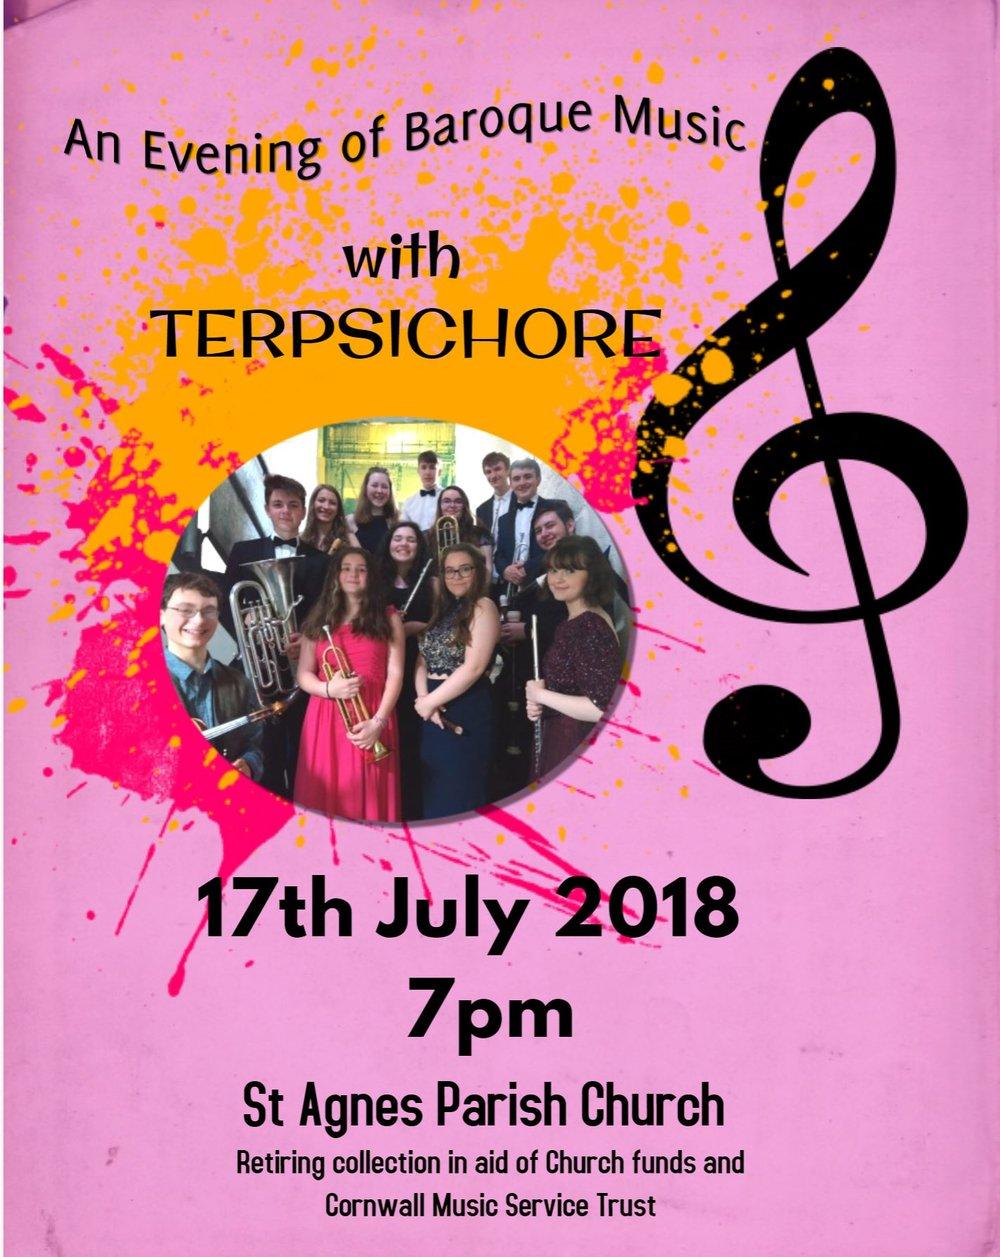 terpsichore july concert poster.JPG